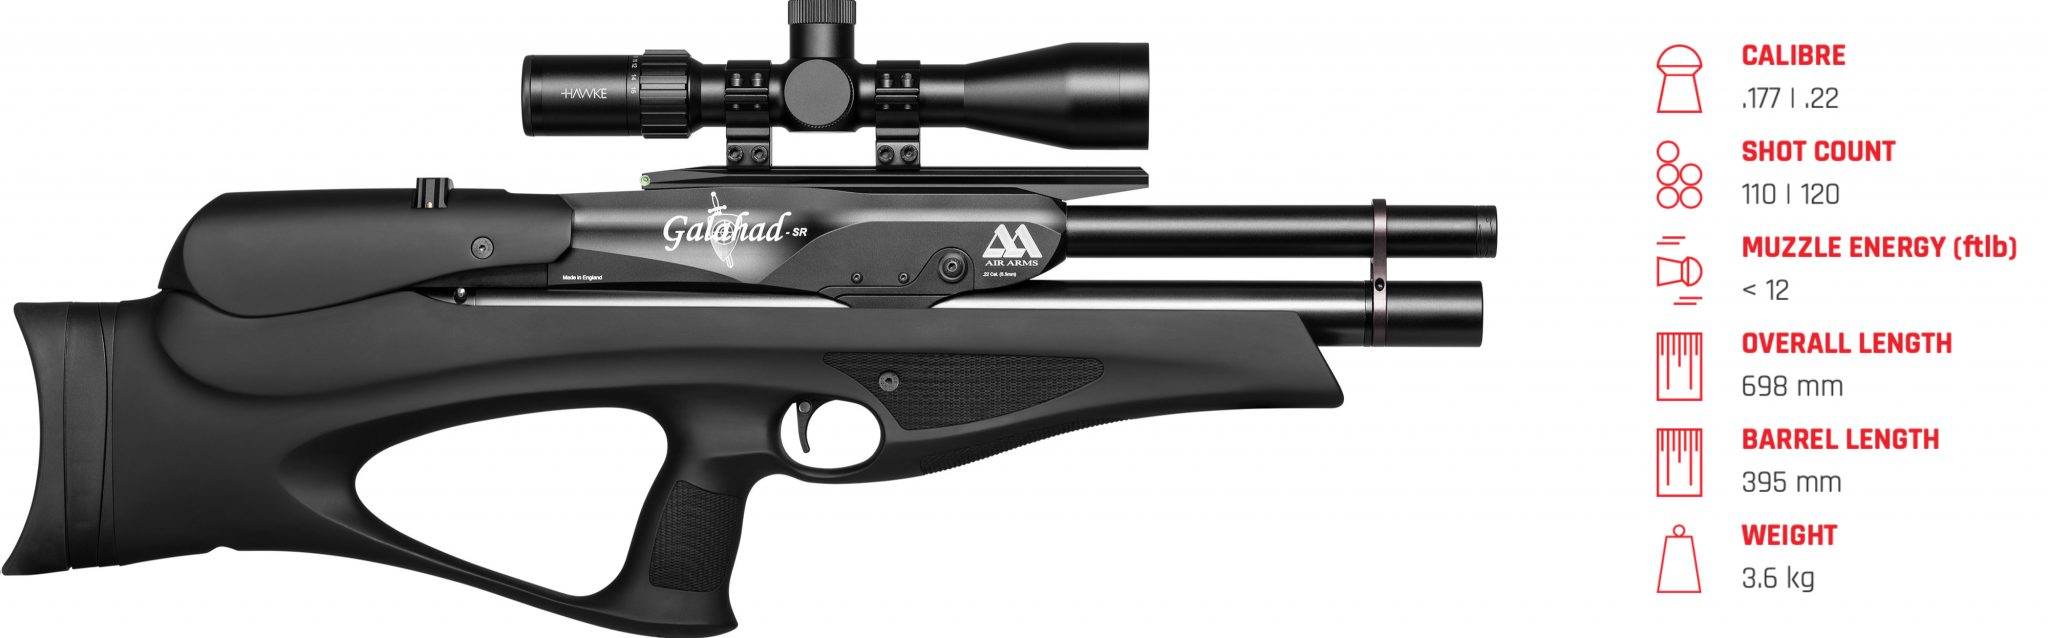 Air Arms Galahad R Black